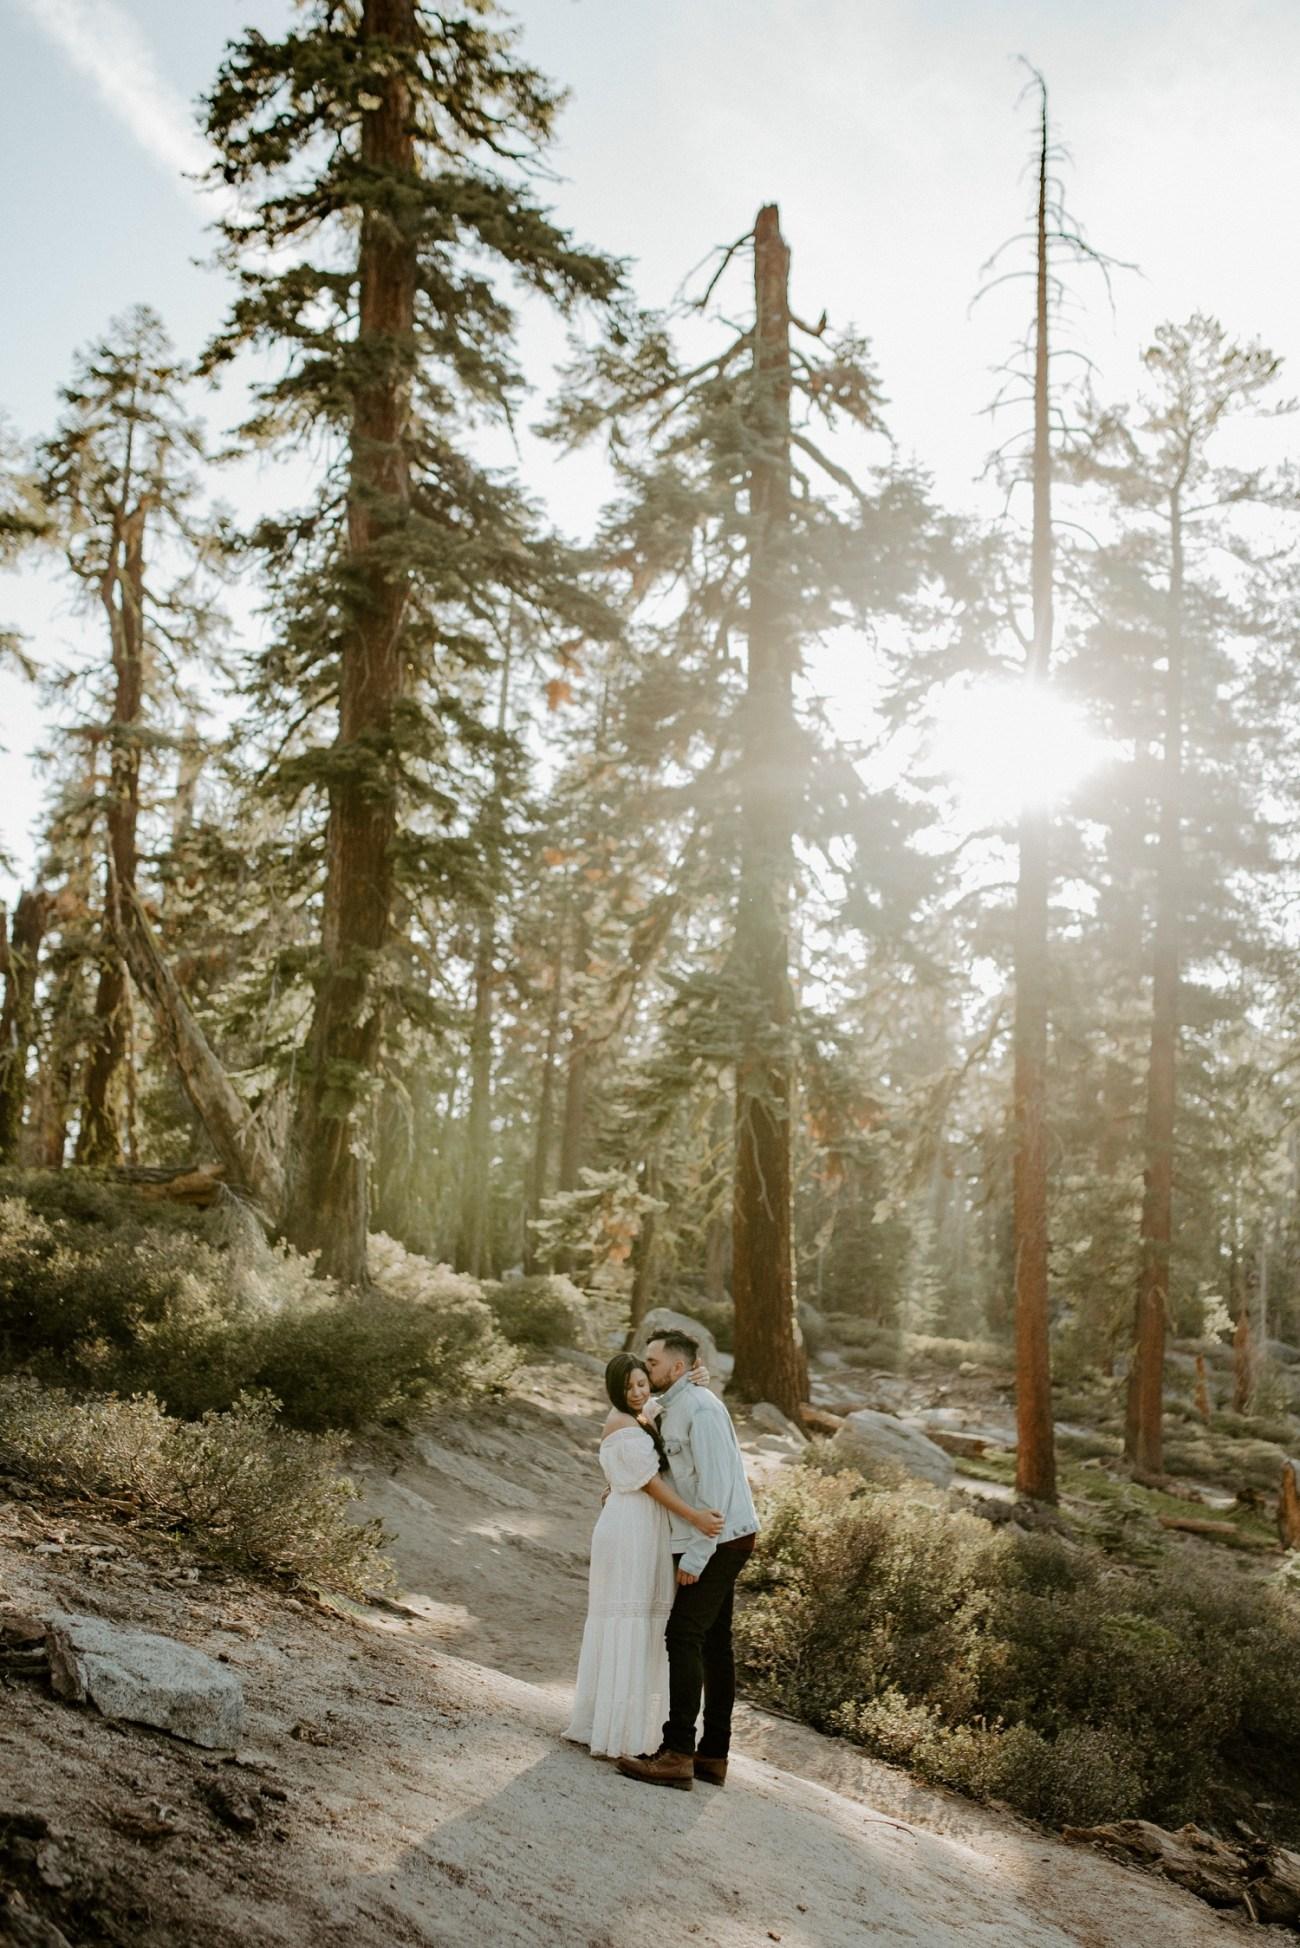 Yosemite National Park Engagement Session Yosemite Elopement Photographer Anais Possamai Photography 08